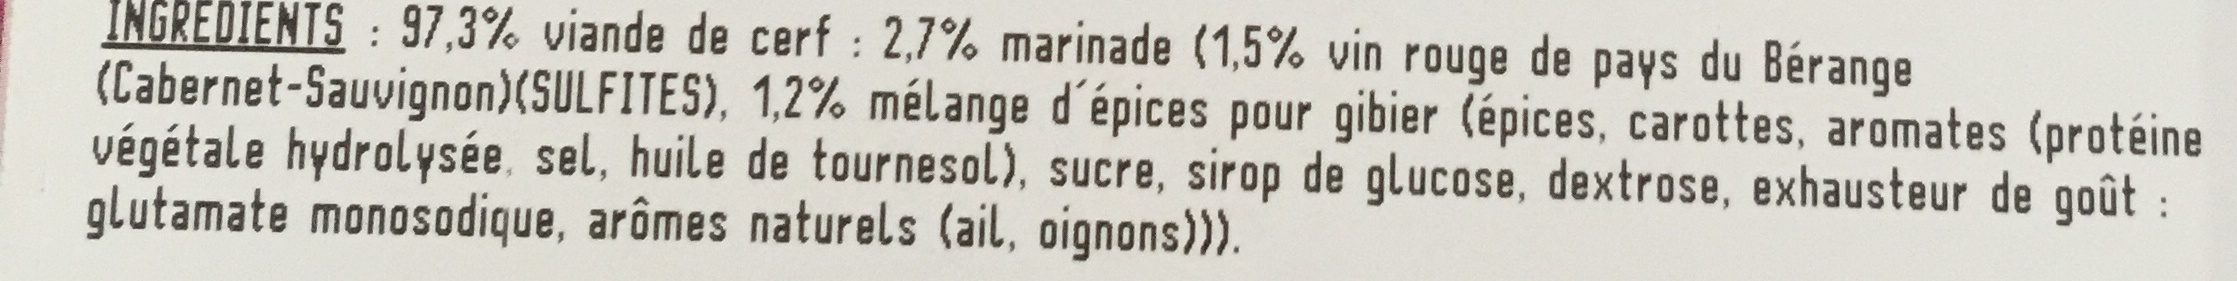 Rôti de Cerf au Vin Rouge - Ingrediënten - fr